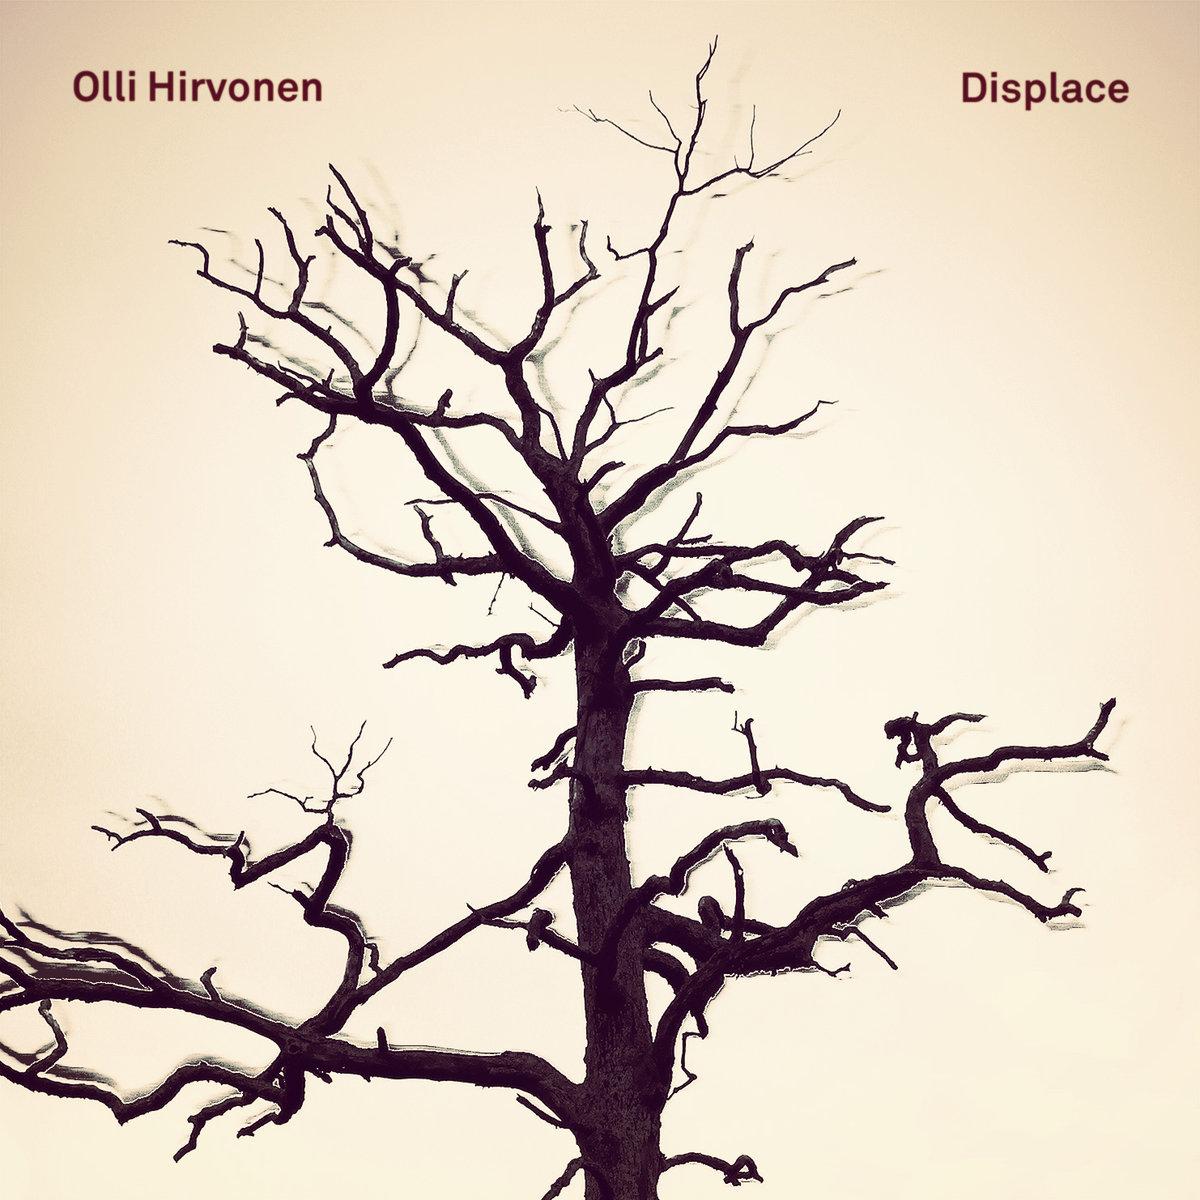 With Olli Hirvonen- Guitar Marty Kenney- Bass Nathan Ellman-Bell- Drums   https://ollihirvonen.bandcamp.com/album/displace